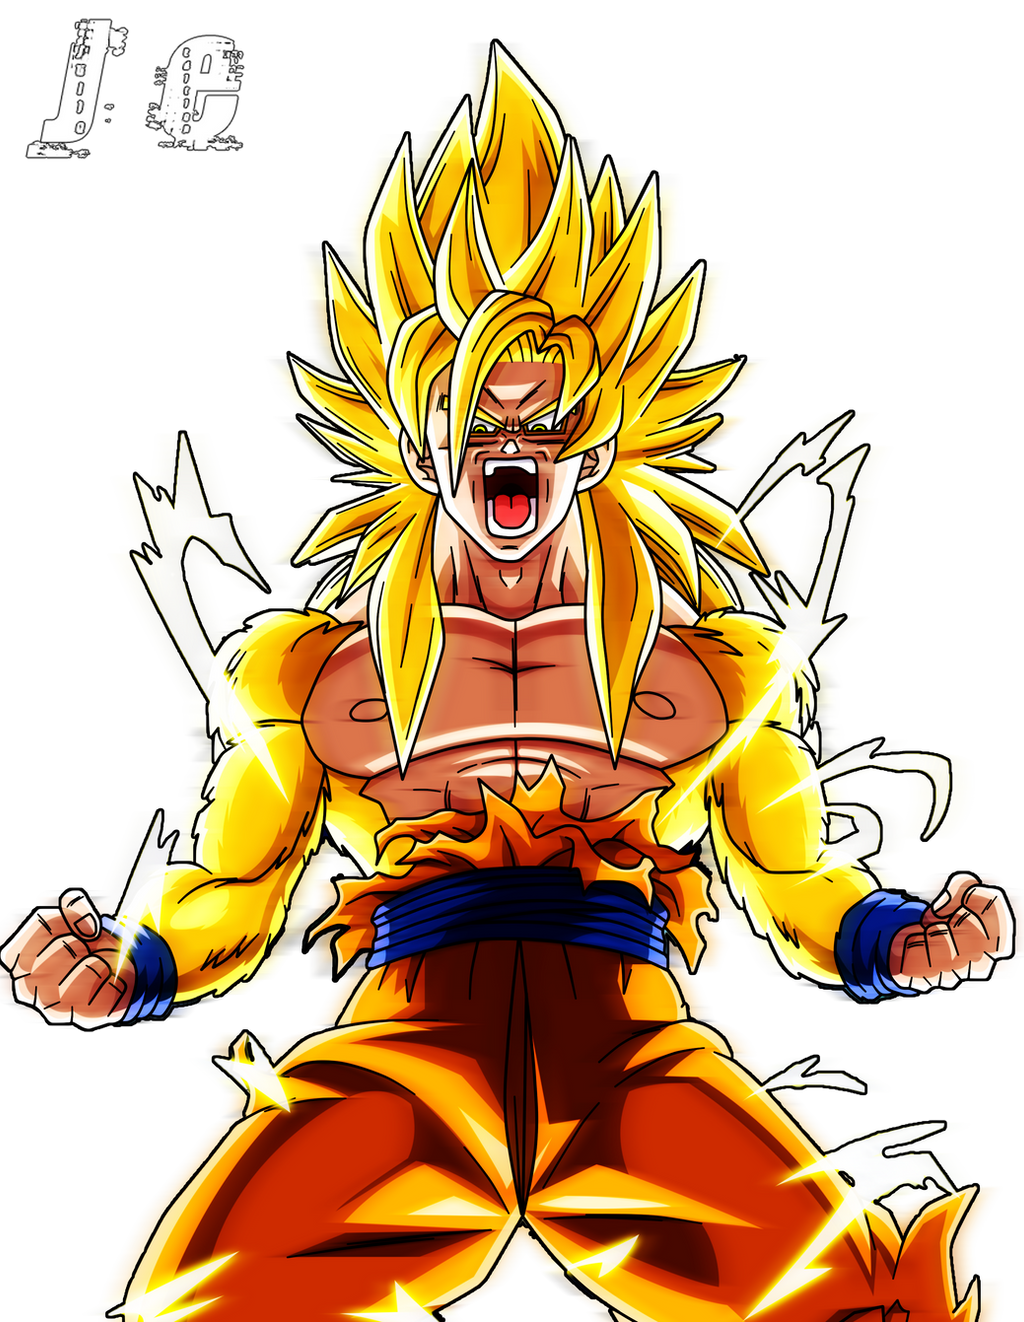 Goku ultra saiyajin ssj 4 con extra Render_de_kakarotto_ssj_dios_dorado_by_juliox11-d75p670